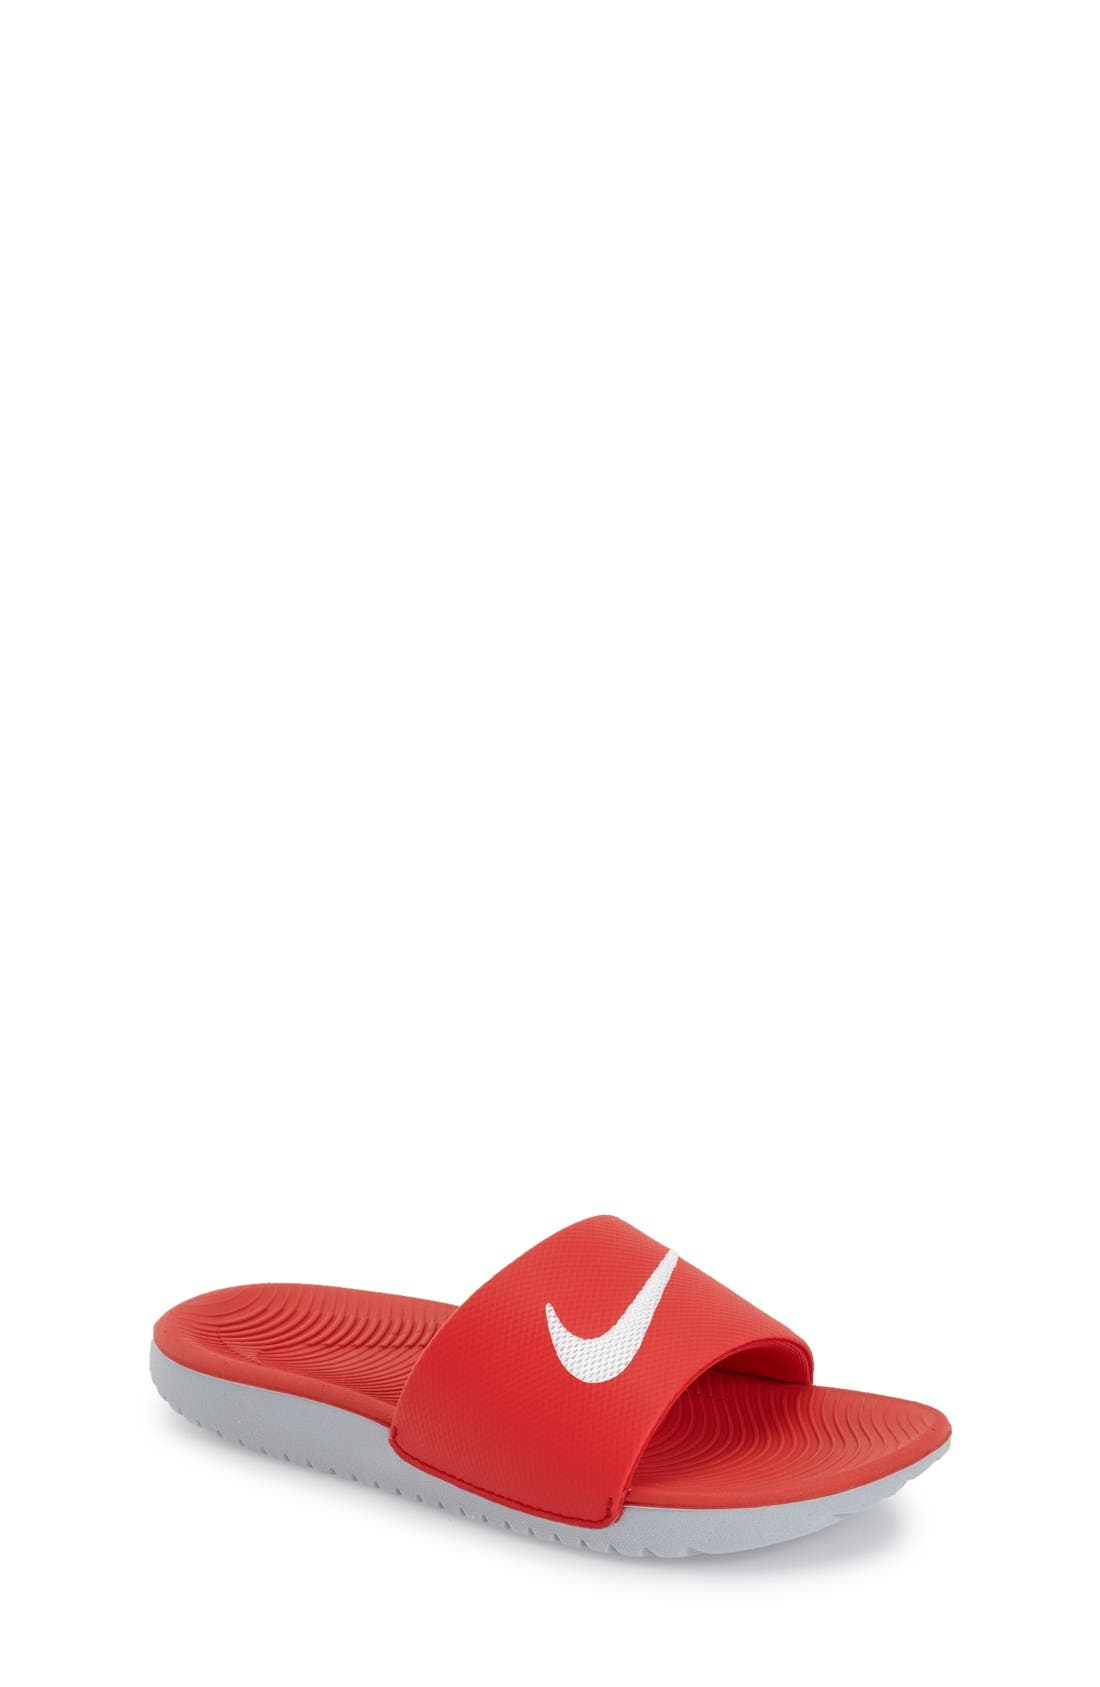 'Kawa' Slide Sandal,                         Main,                         color, University Red/ White